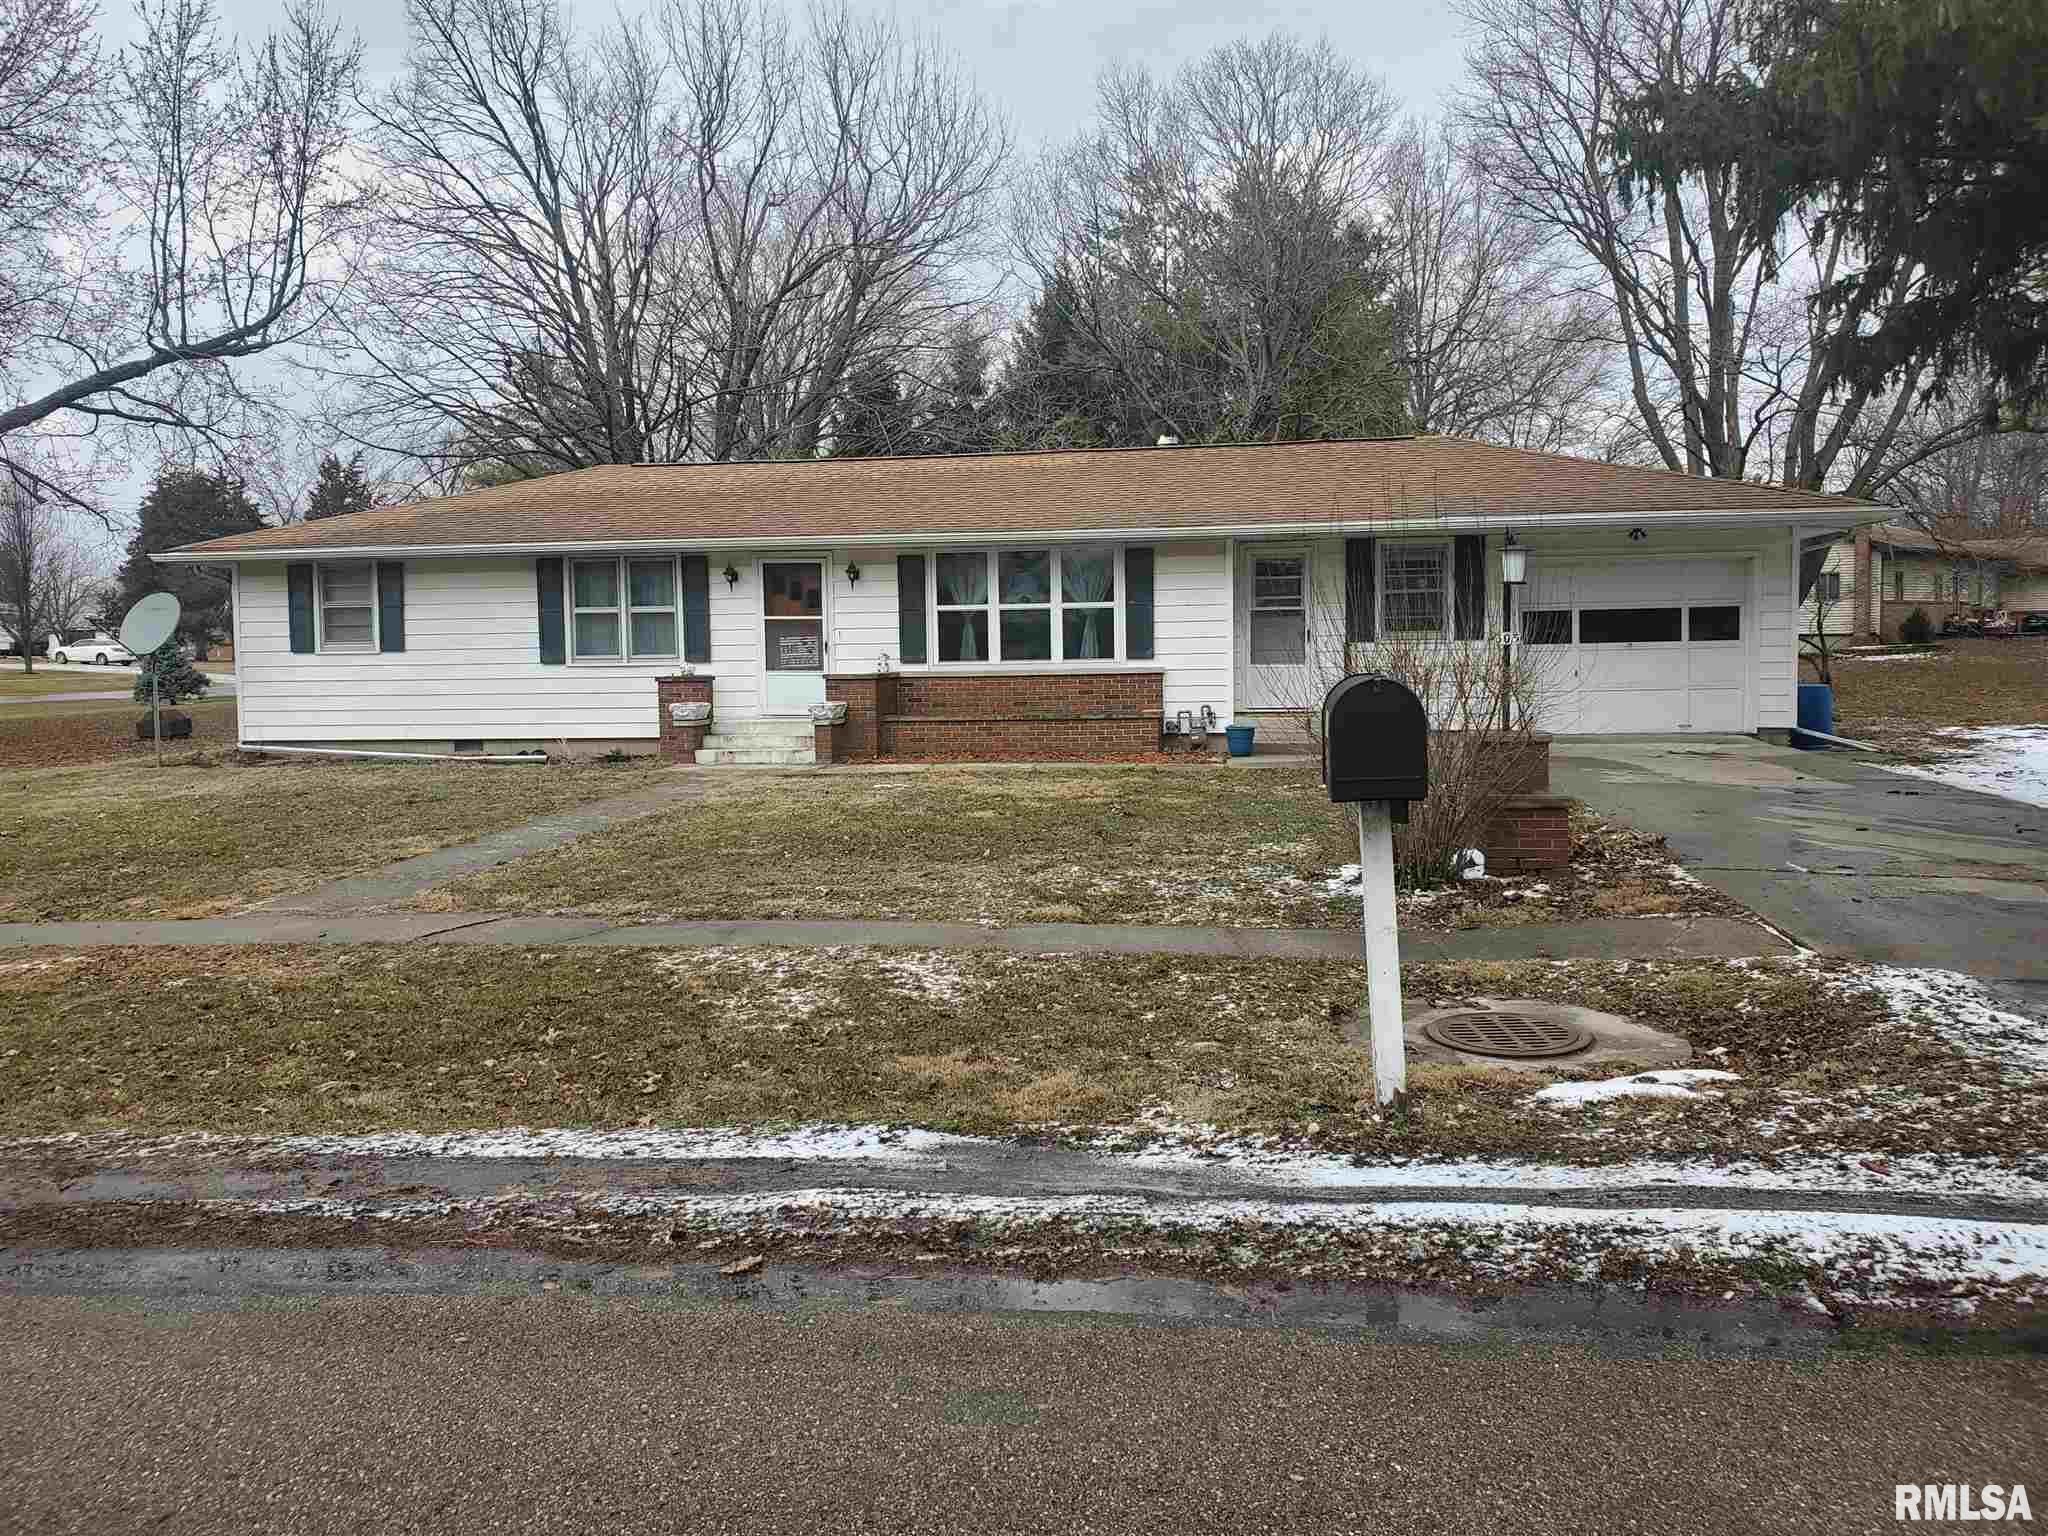 305 W MECHANIC Property Photo - Ashland, IL real estate listing